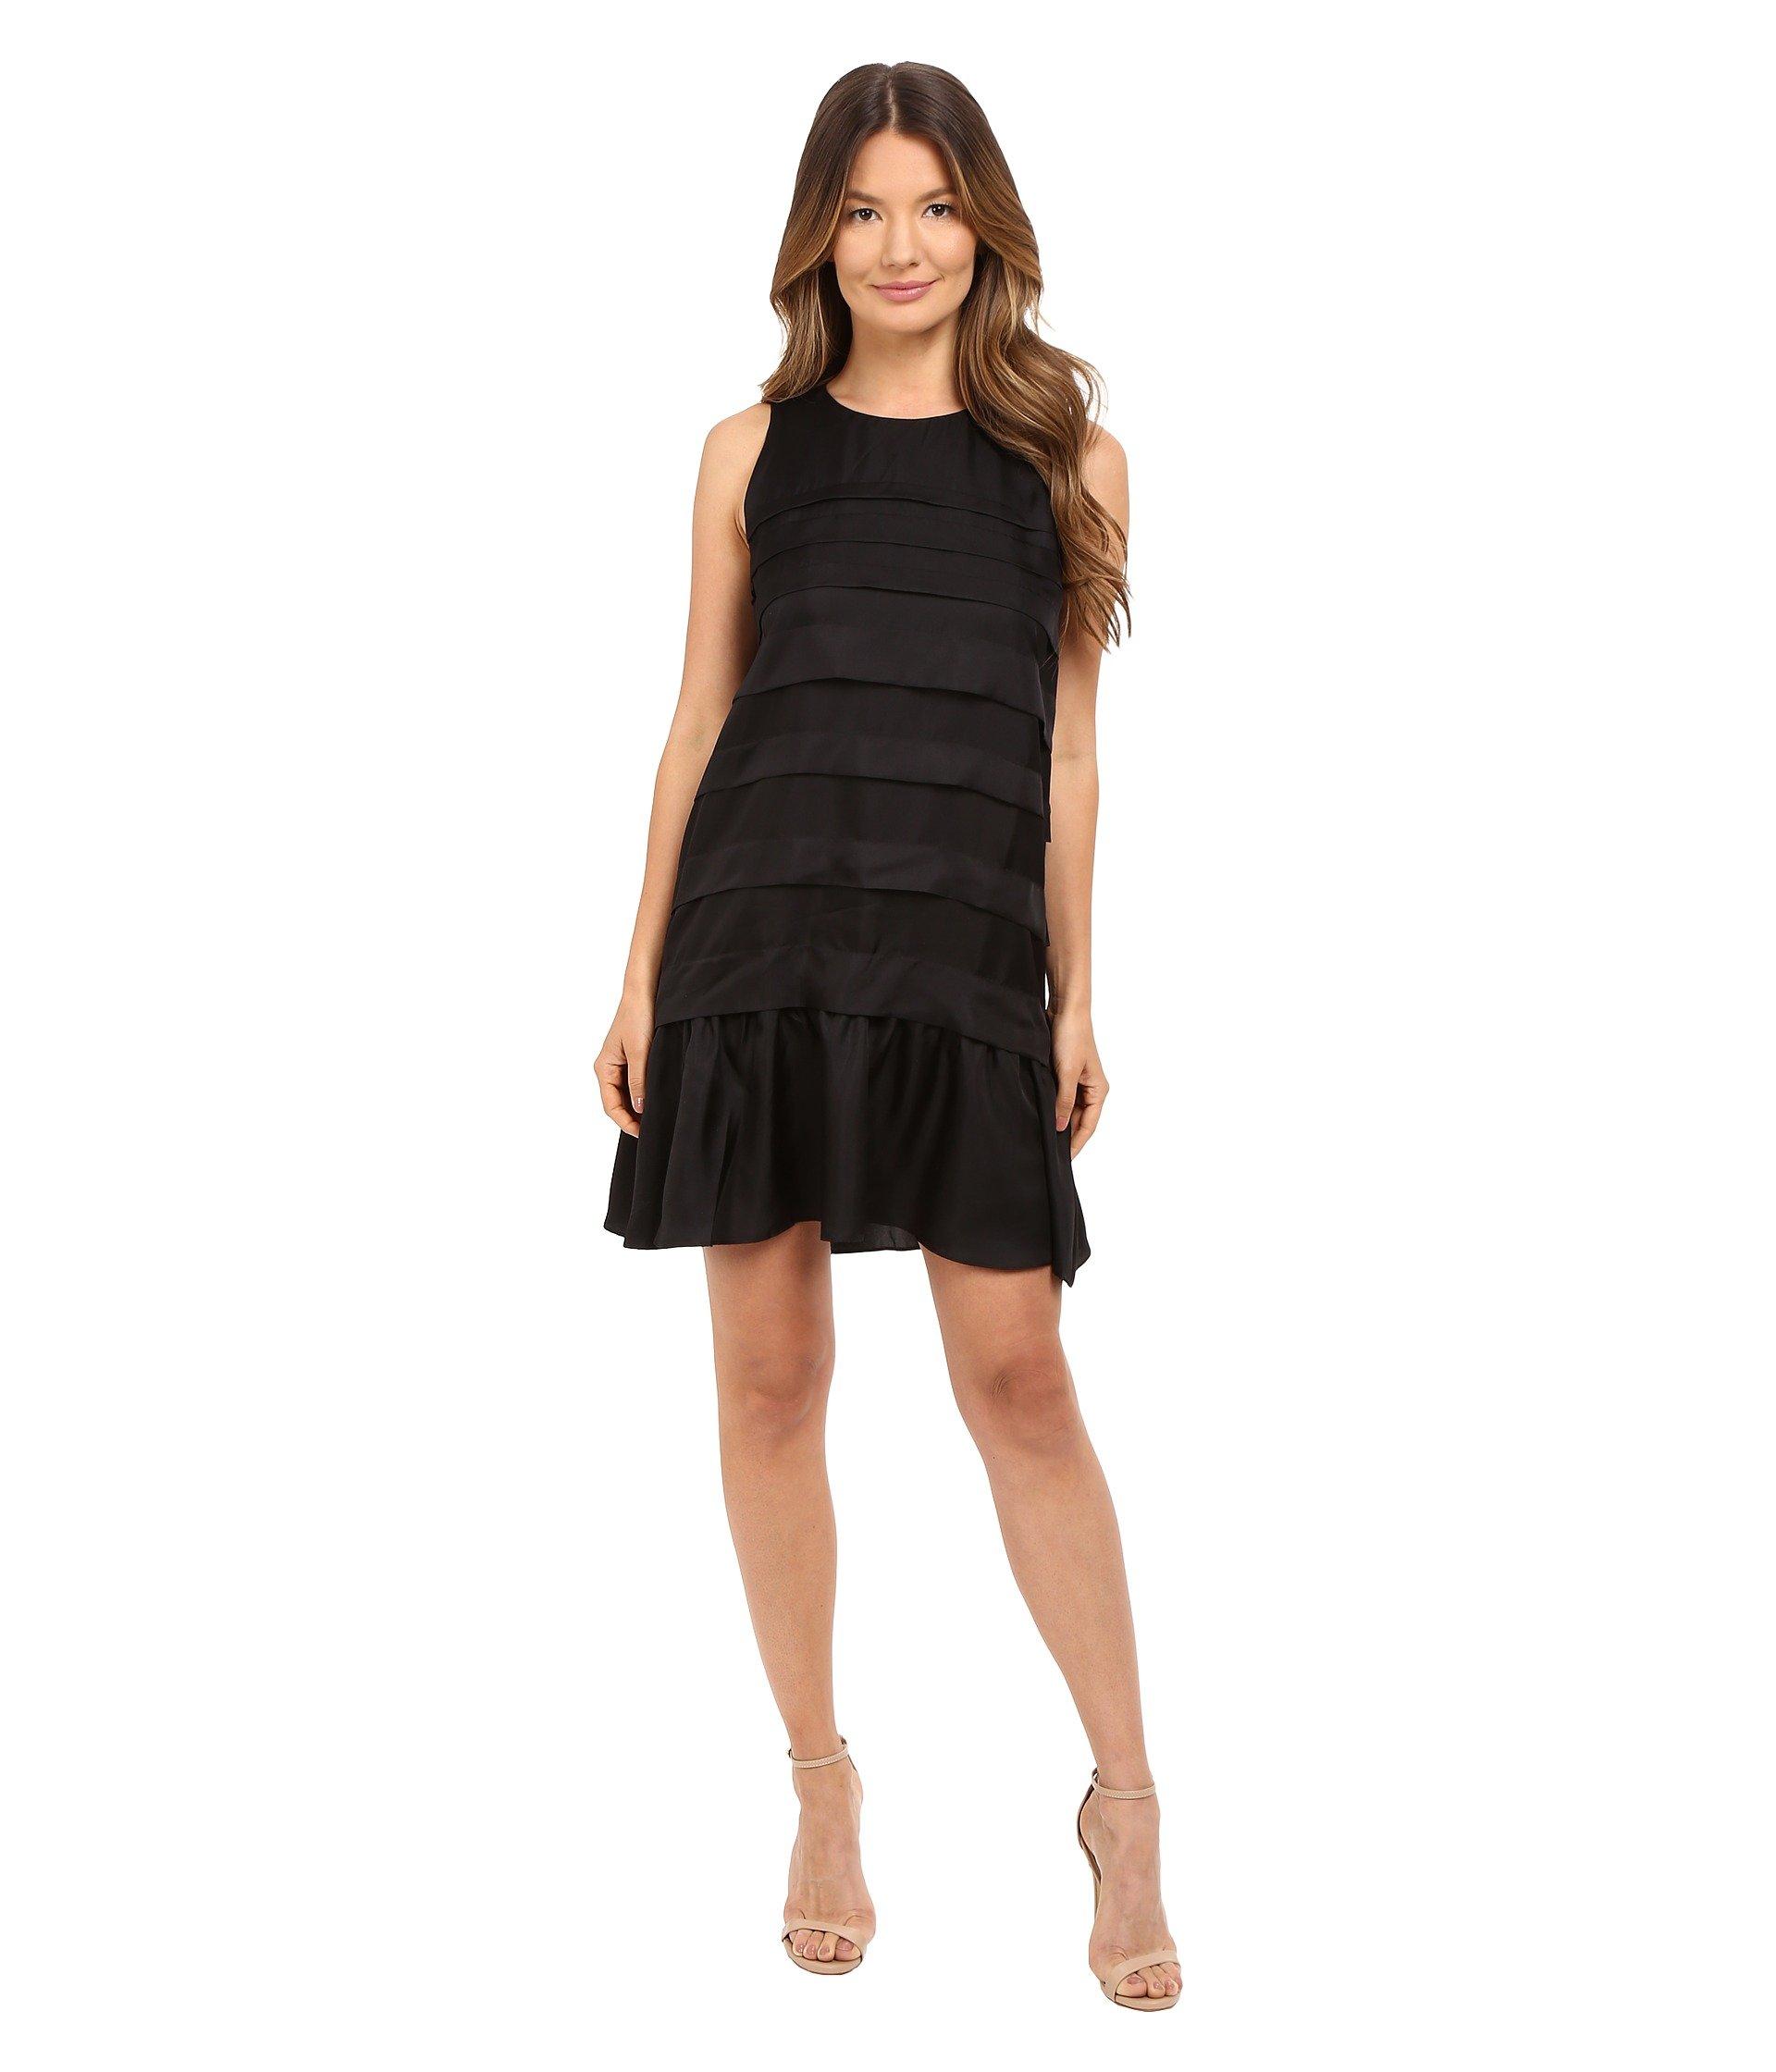 Vestido para Mujer ZAC Zac Posen Monica Dress  + ZAC Zac Posen en VeoyCompro.net